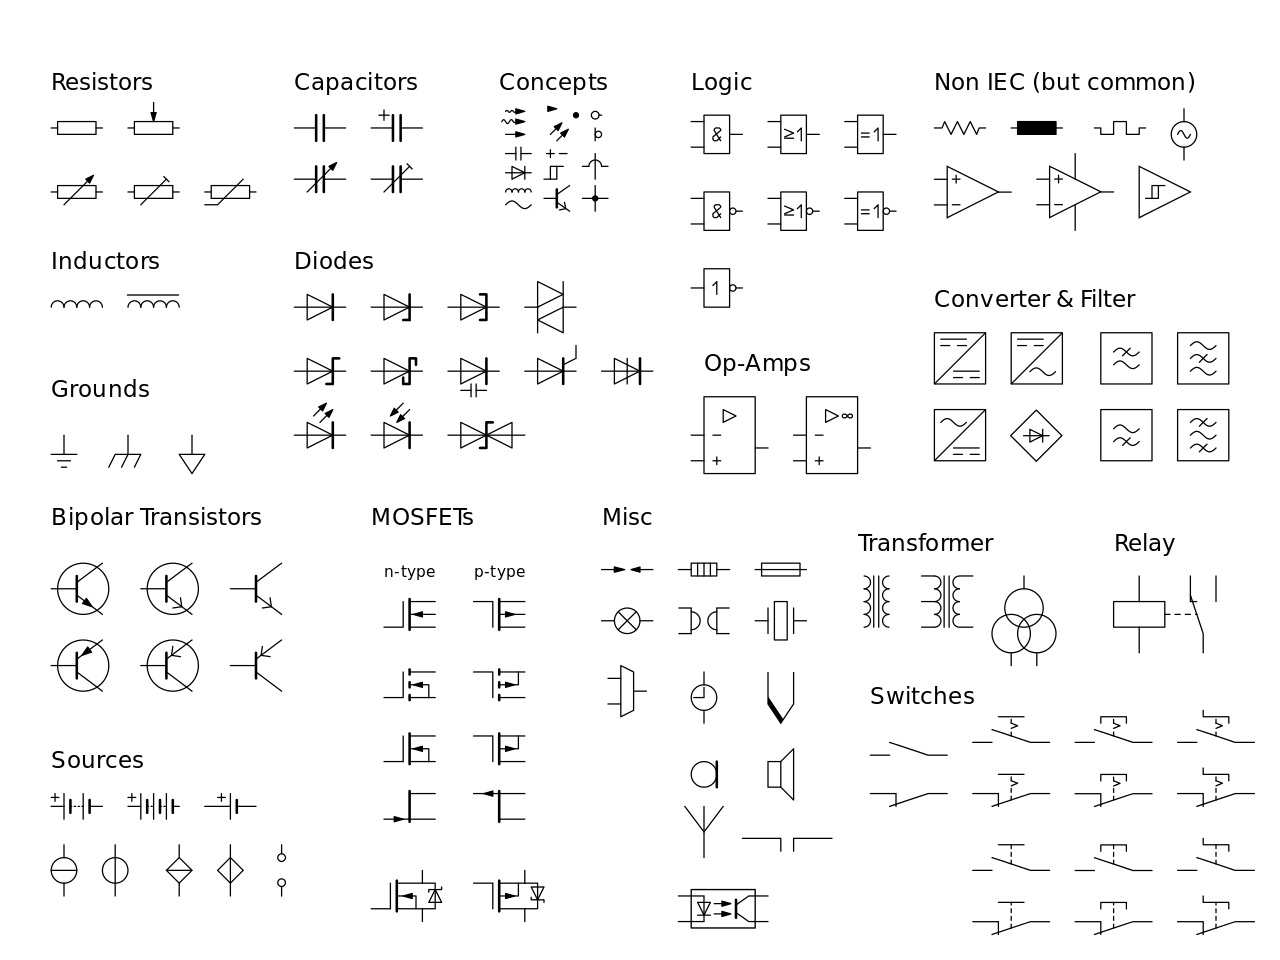 File:Electrical Symbols IEC.svg.